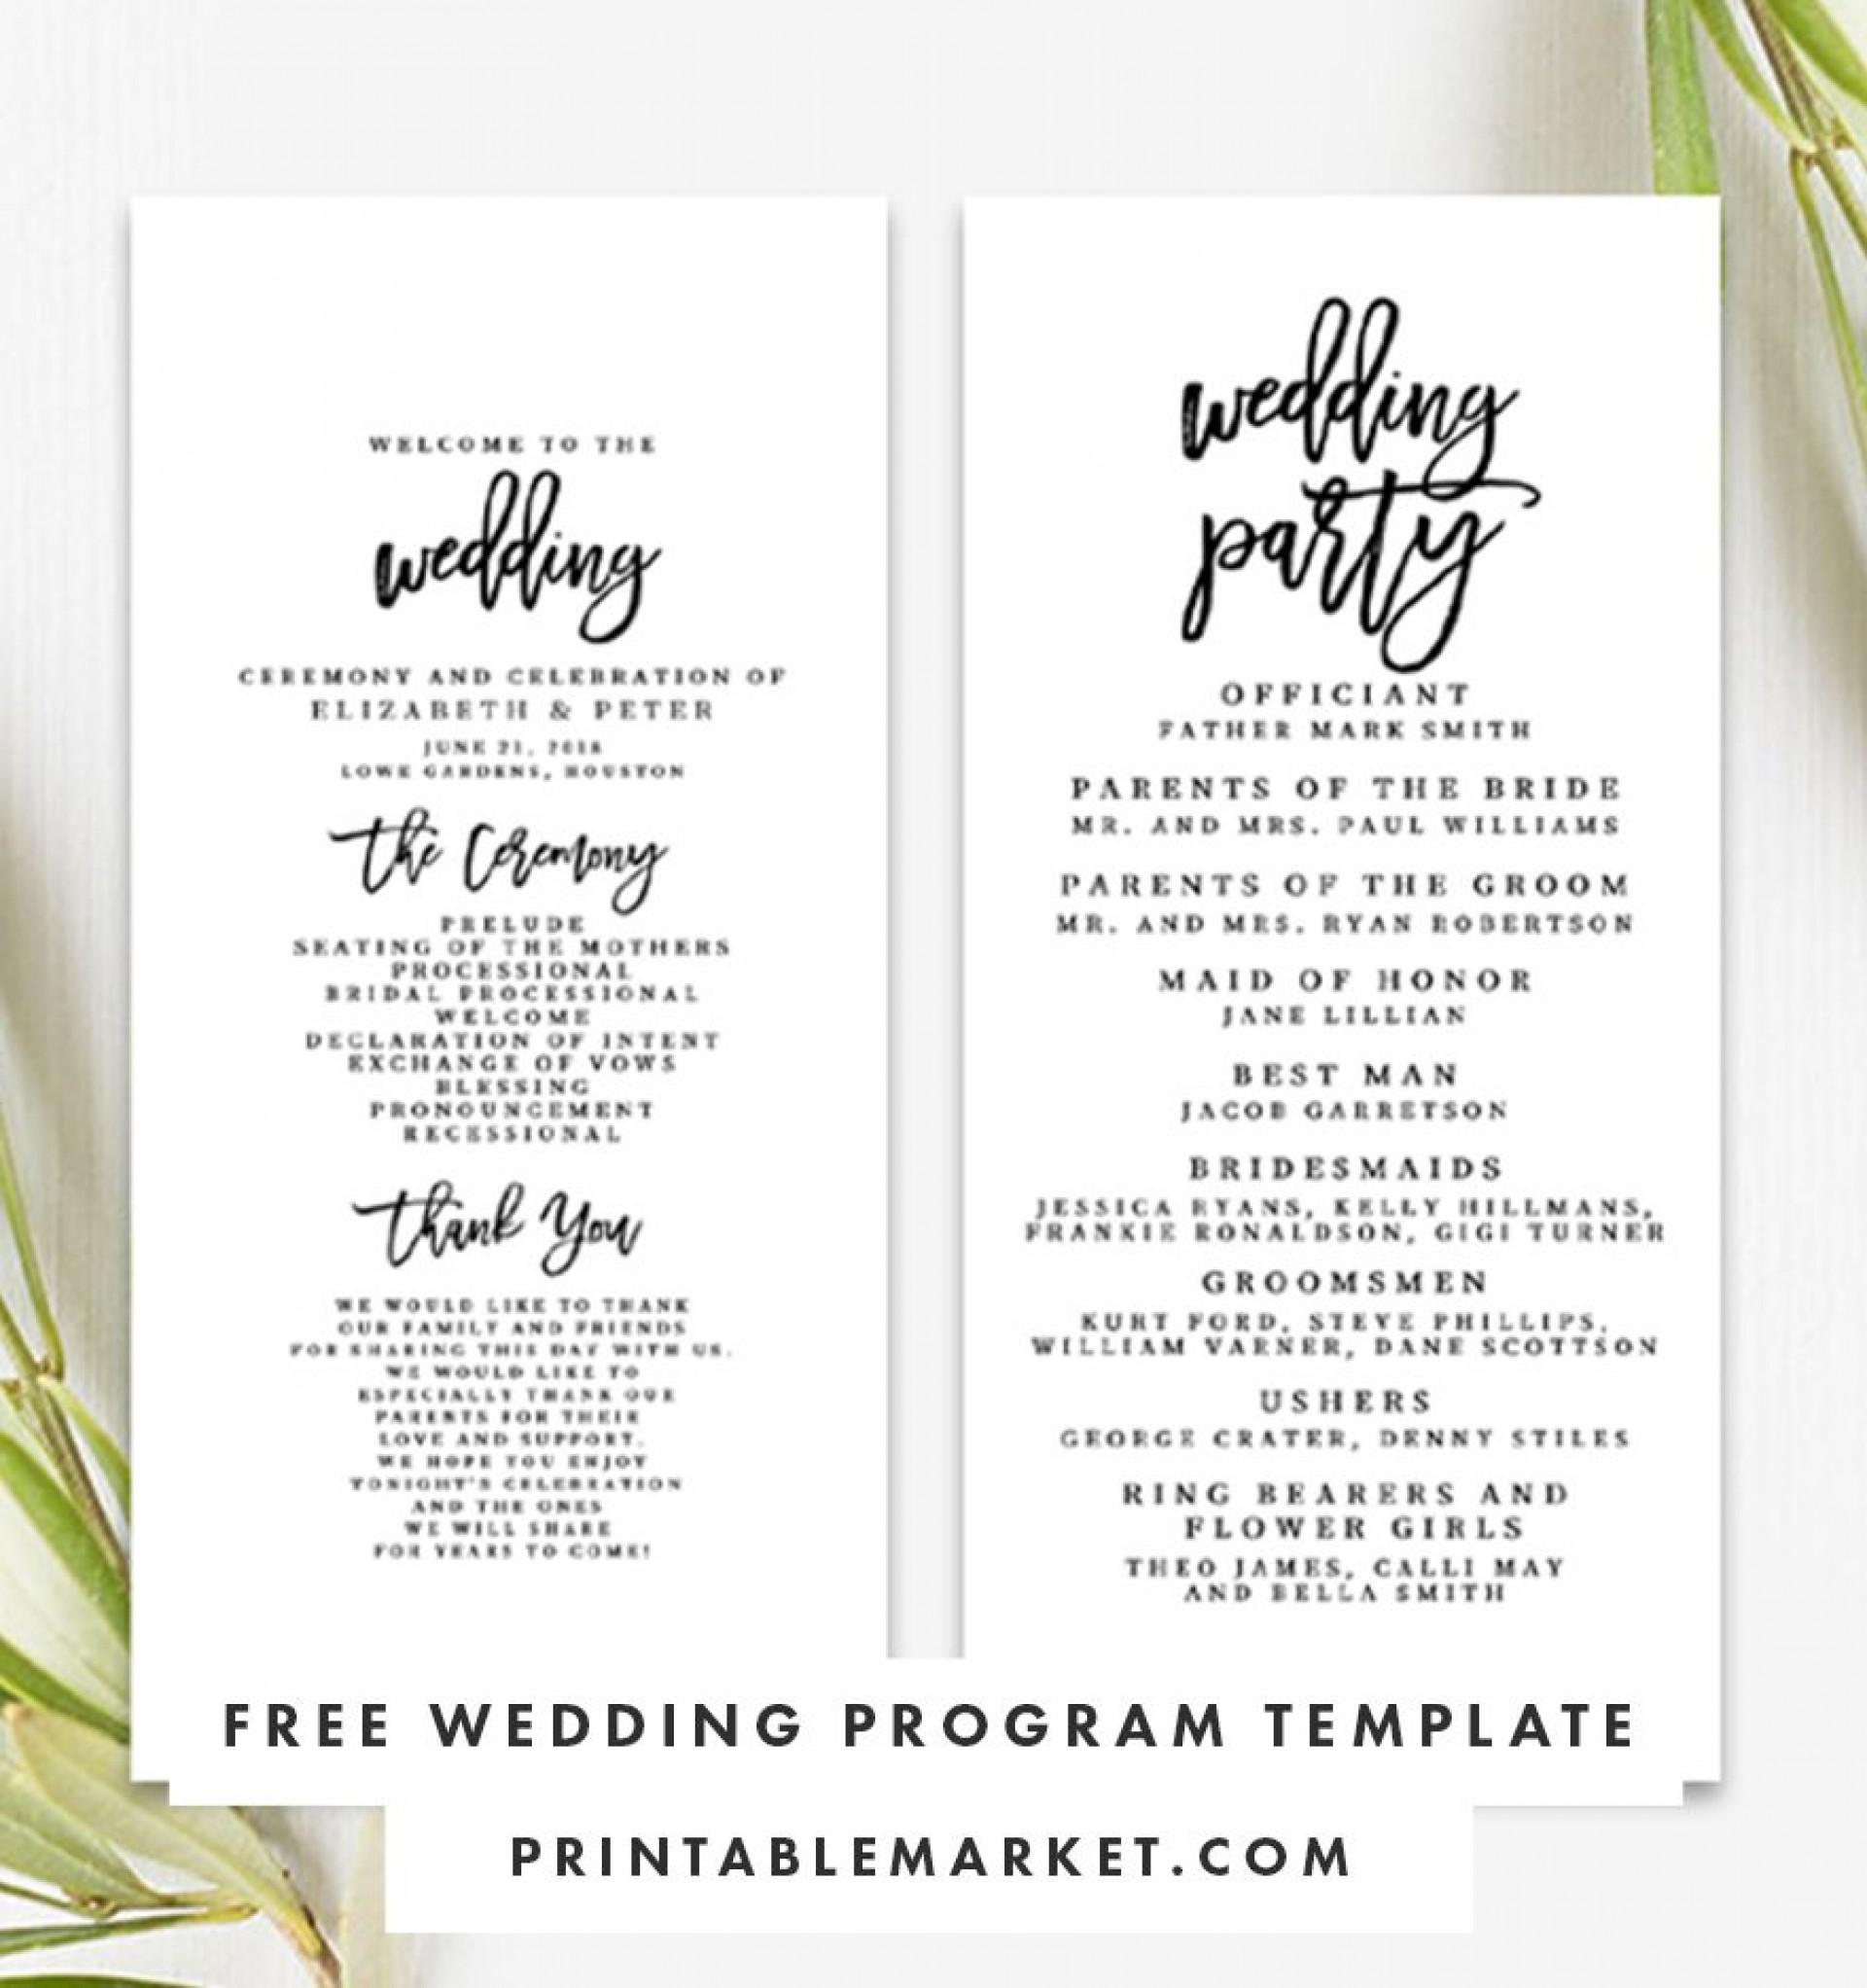 008 Astounding Free Download Template For Wedding Program High Def  Programs1920